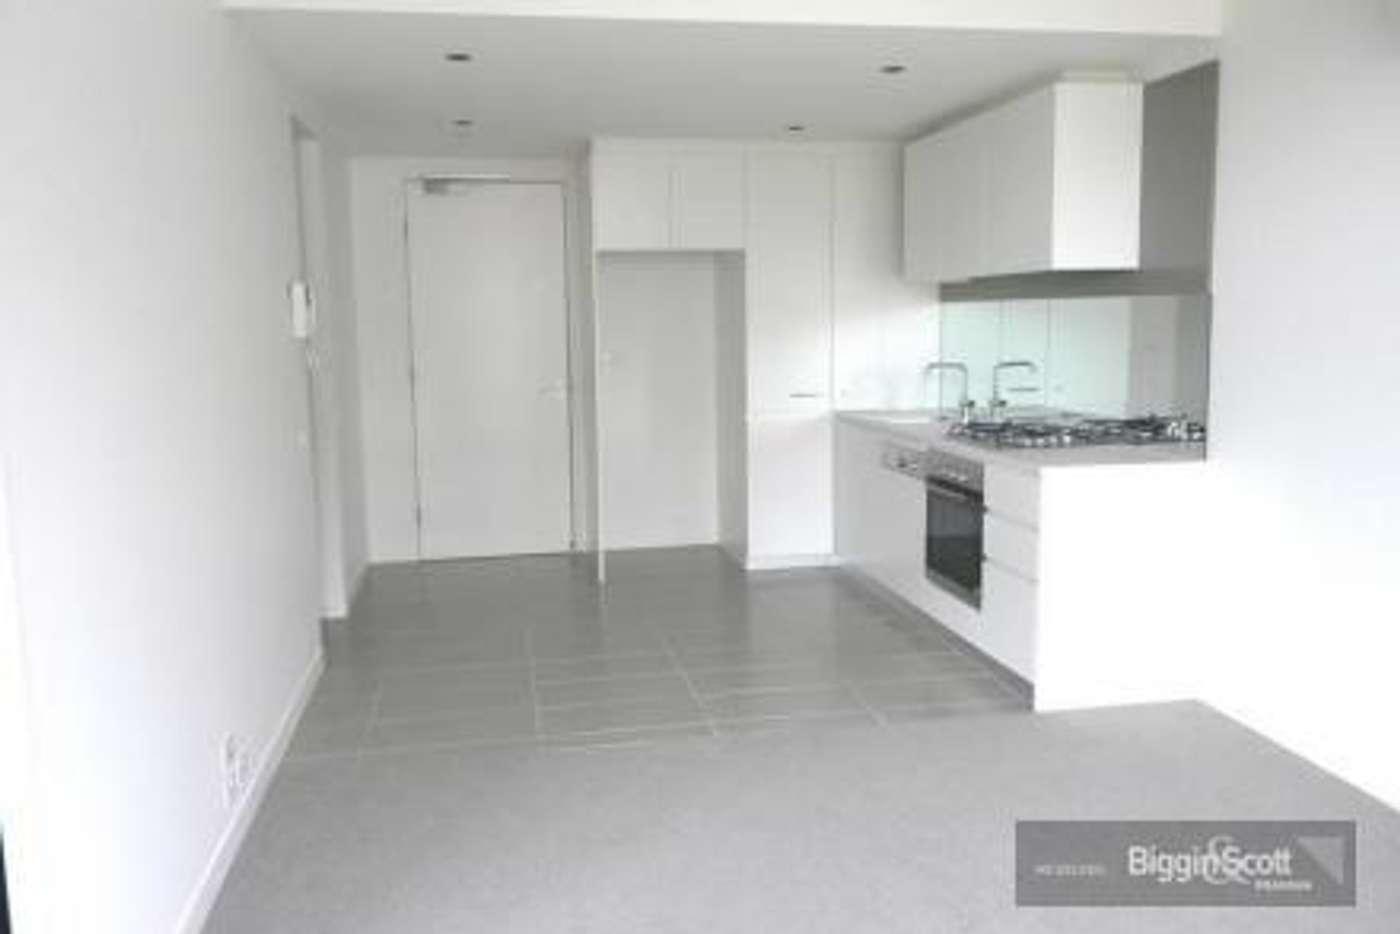 Main view of Homely apartment listing, 207/770B Toorak Road, Glen Iris VIC 3146